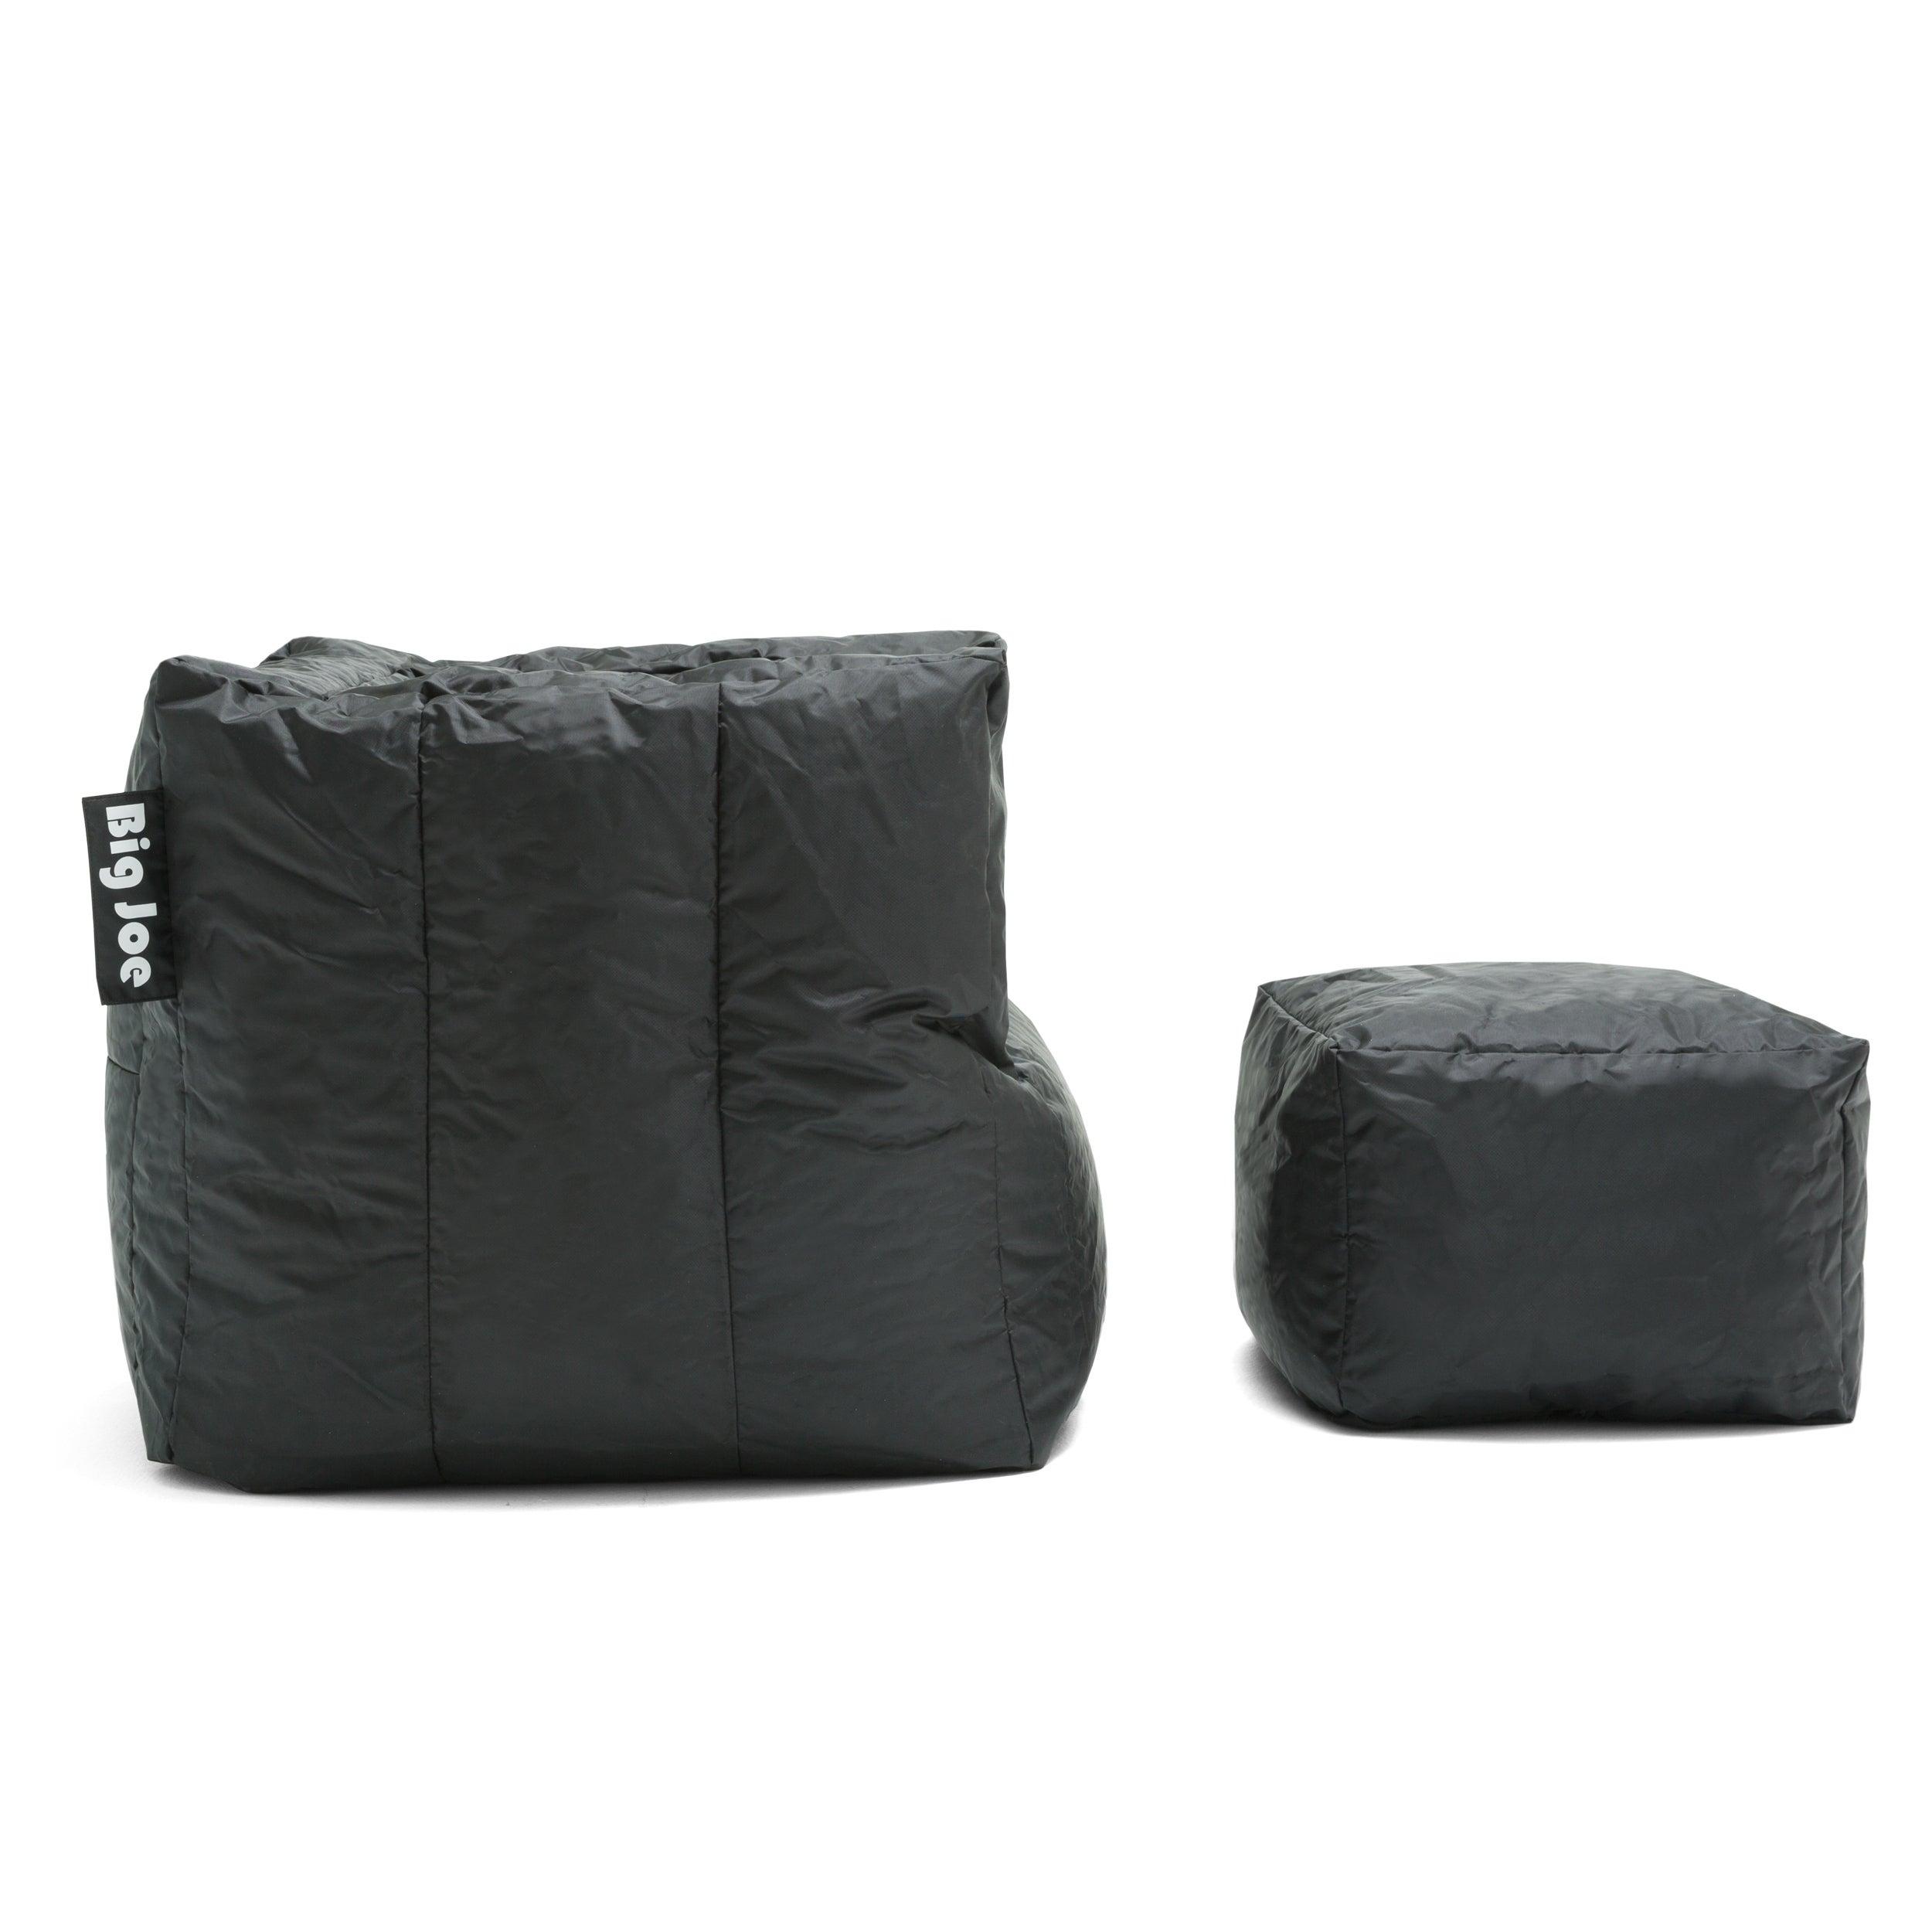 Strange Big Joe Cube Ottoman Bean Bag Lounger Stretch Limo Black Smartmax Evergreenethics Interior Chair Design Evergreenethicsorg